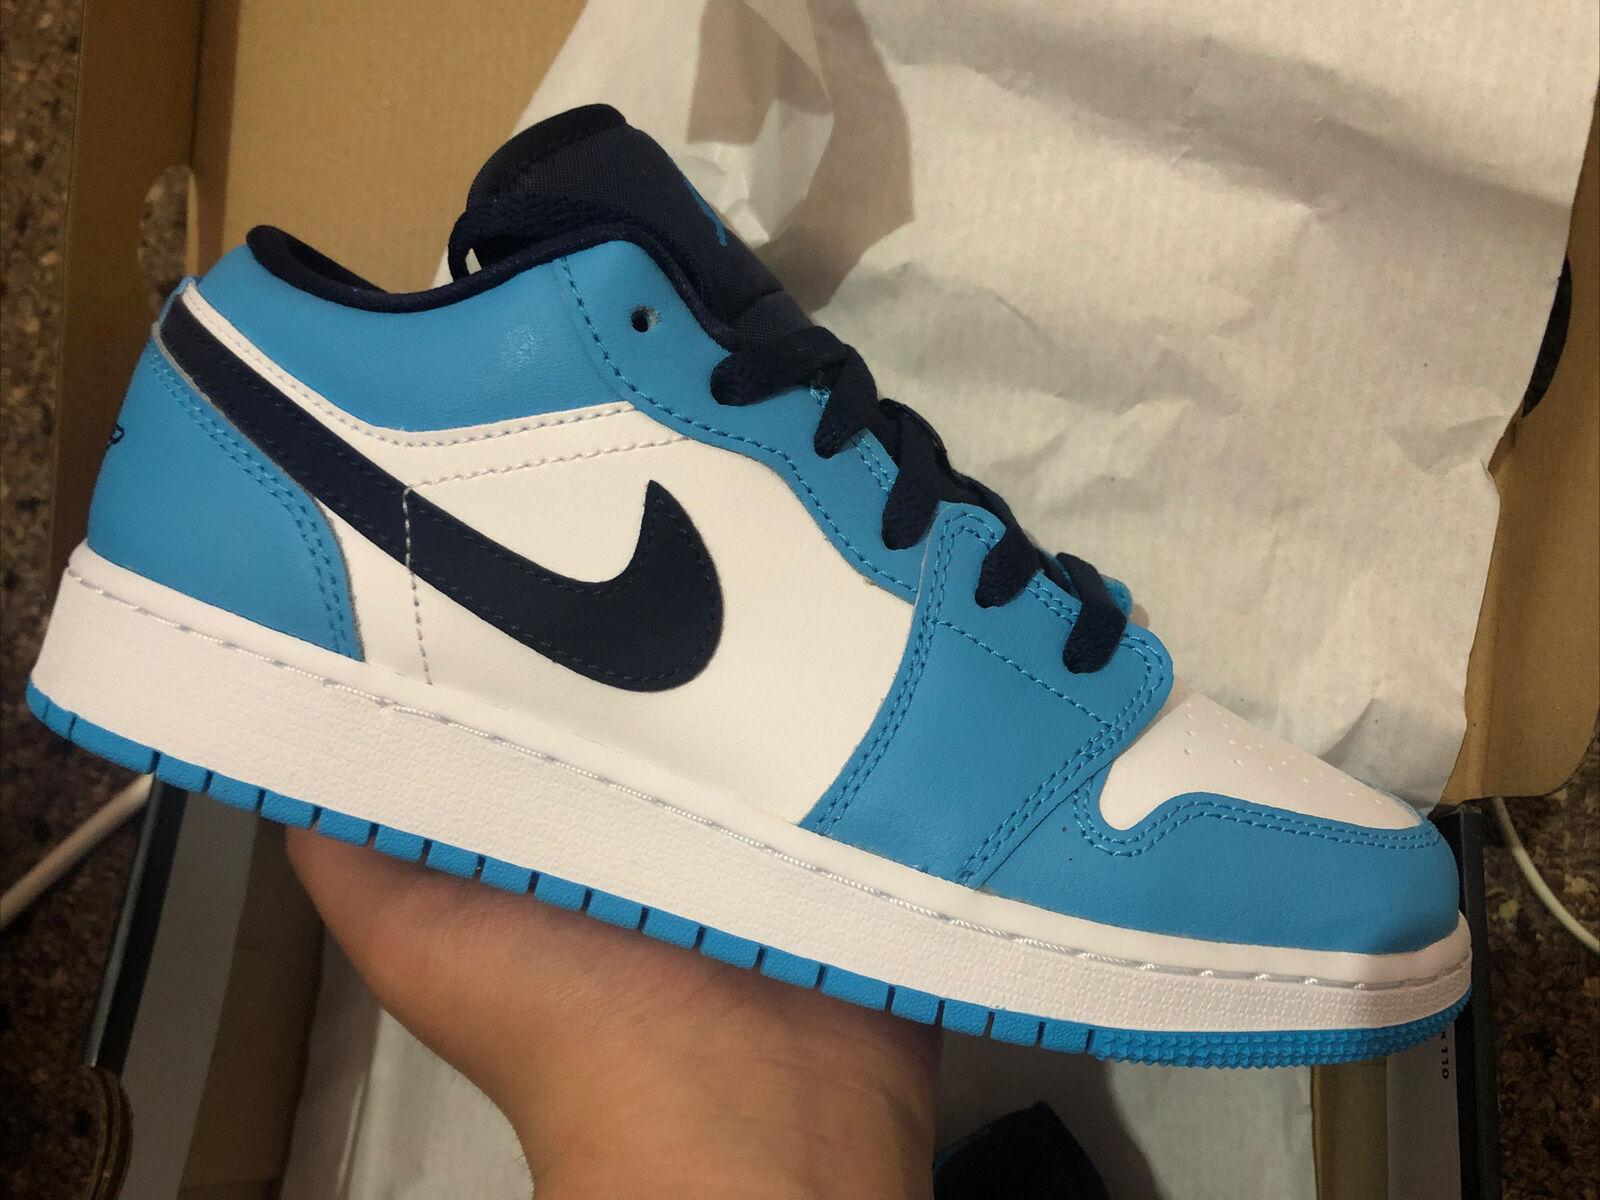 Nike Air Jordan 1 Low GS UNC (University Blue/Obsidian) - Size UK6 - New